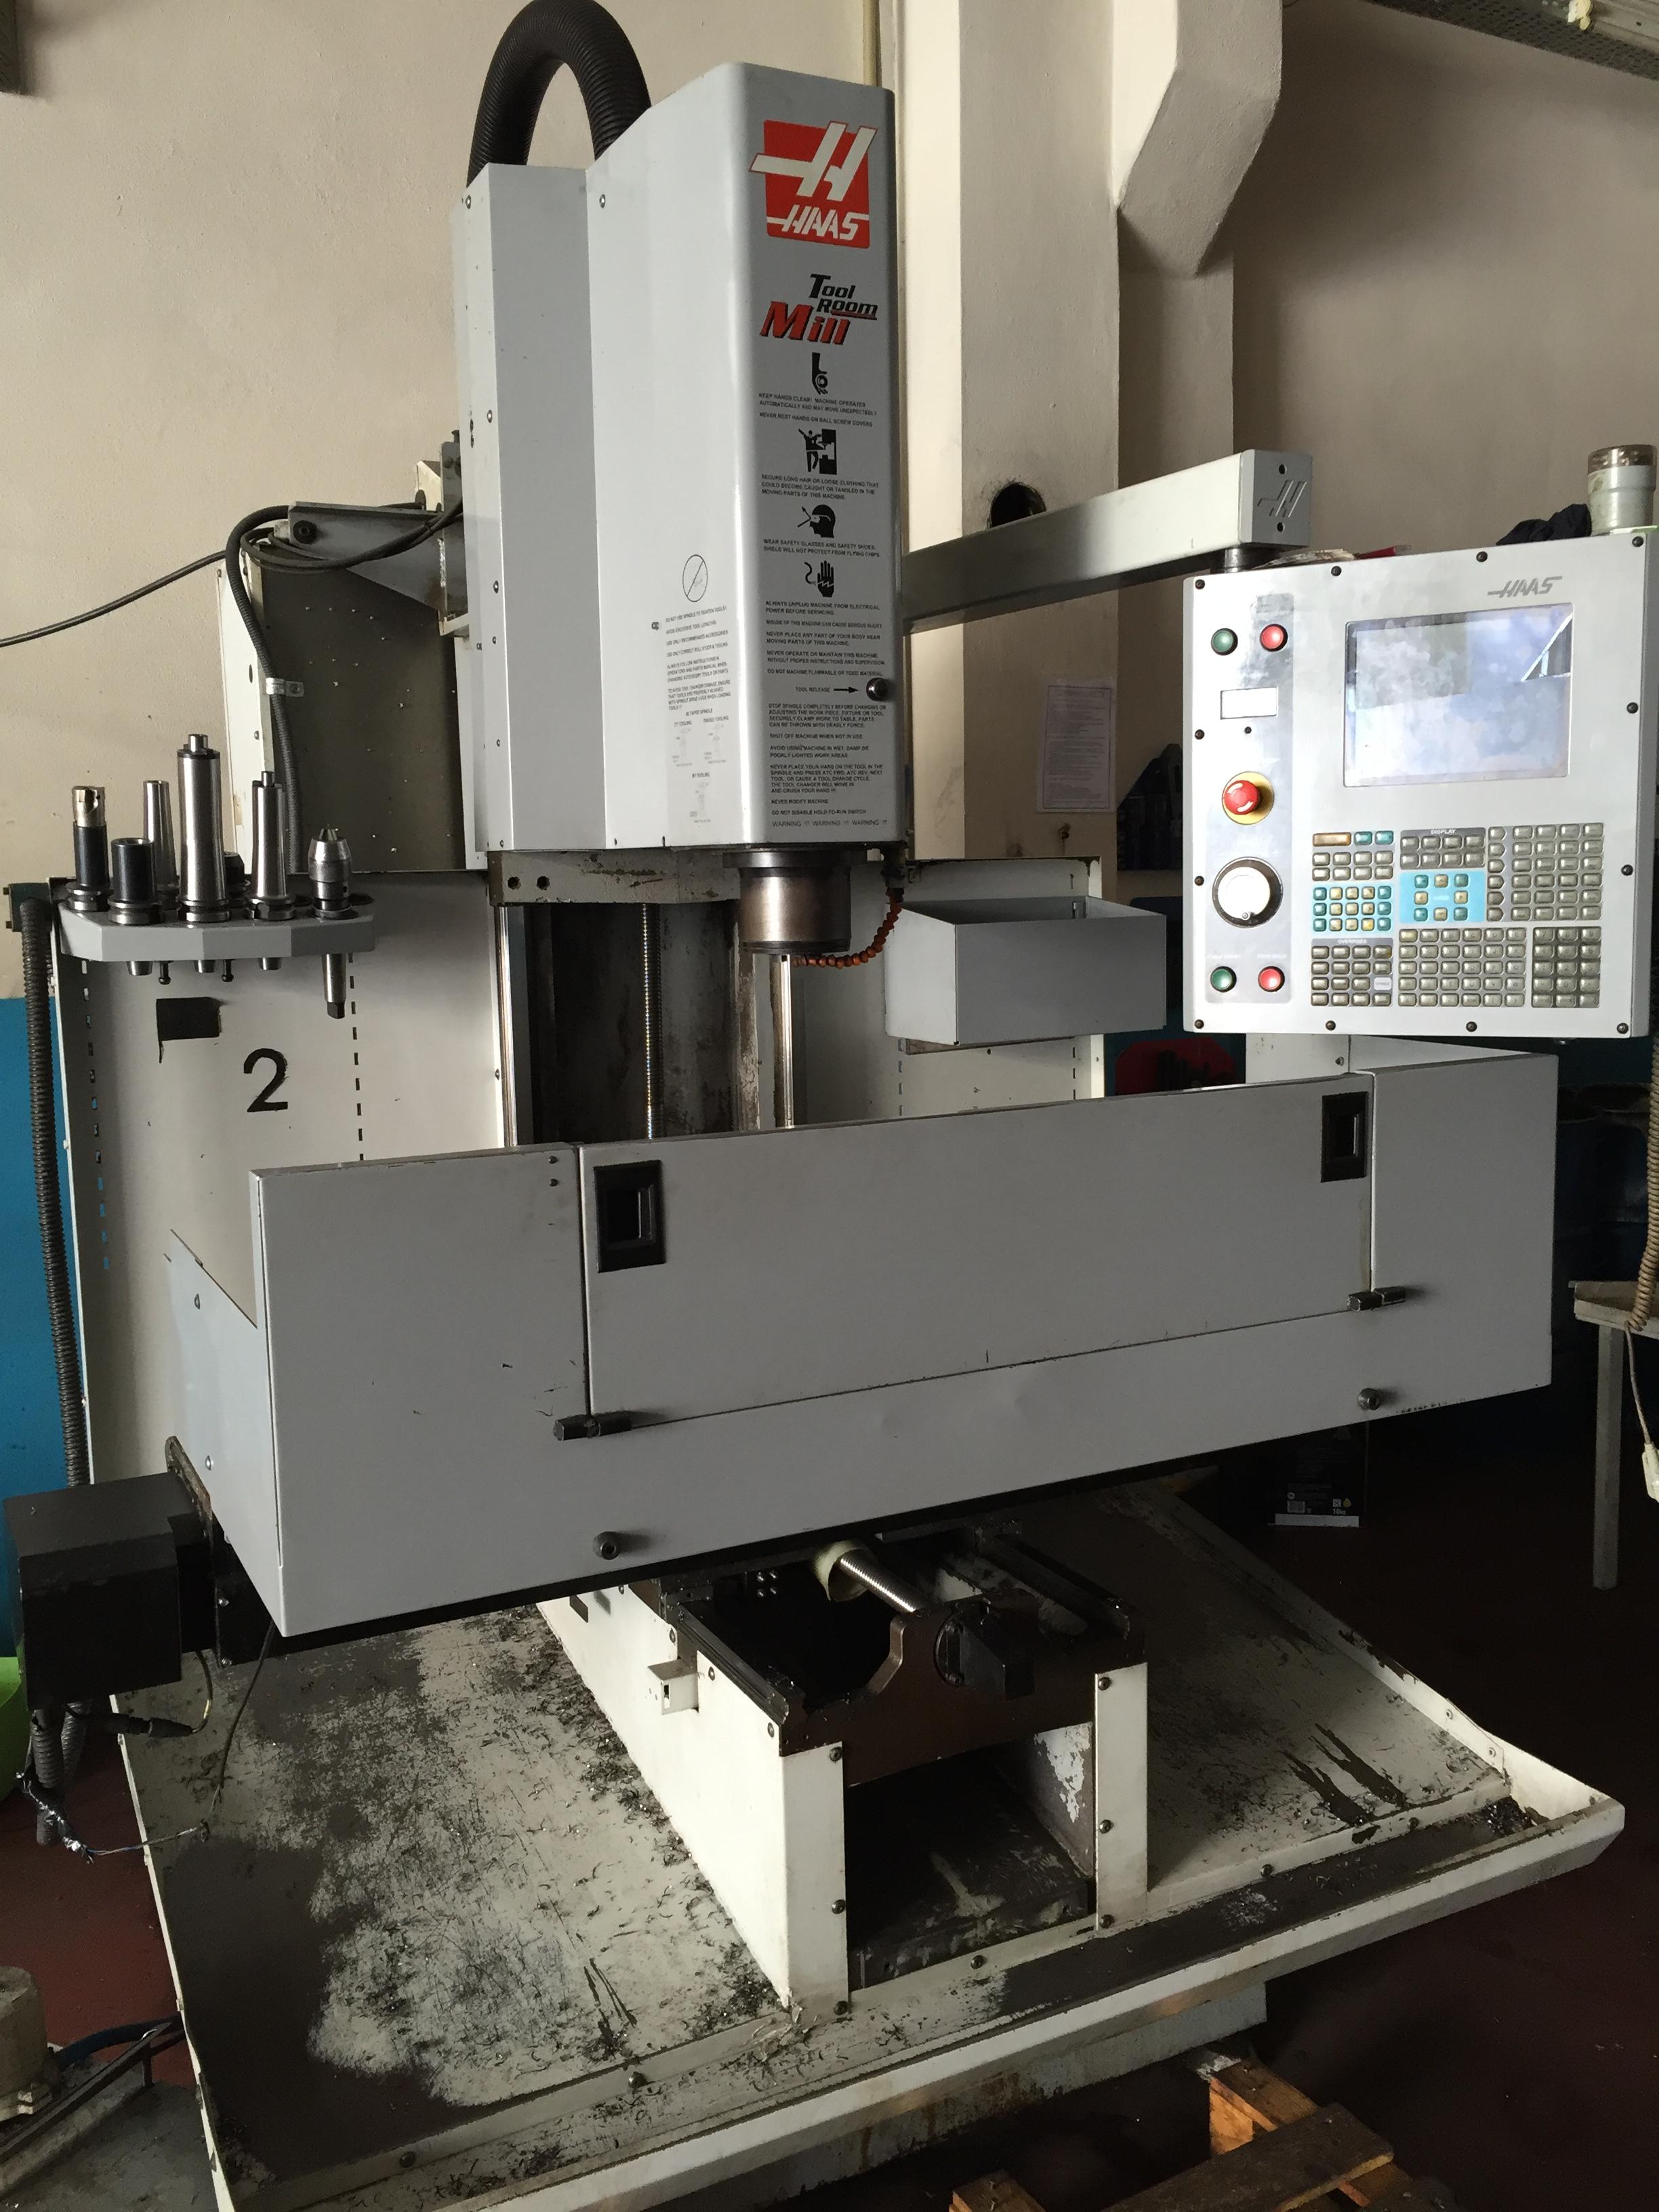 Haas Tm2 Cnc Cnc Vertical Milling Machine Exapro